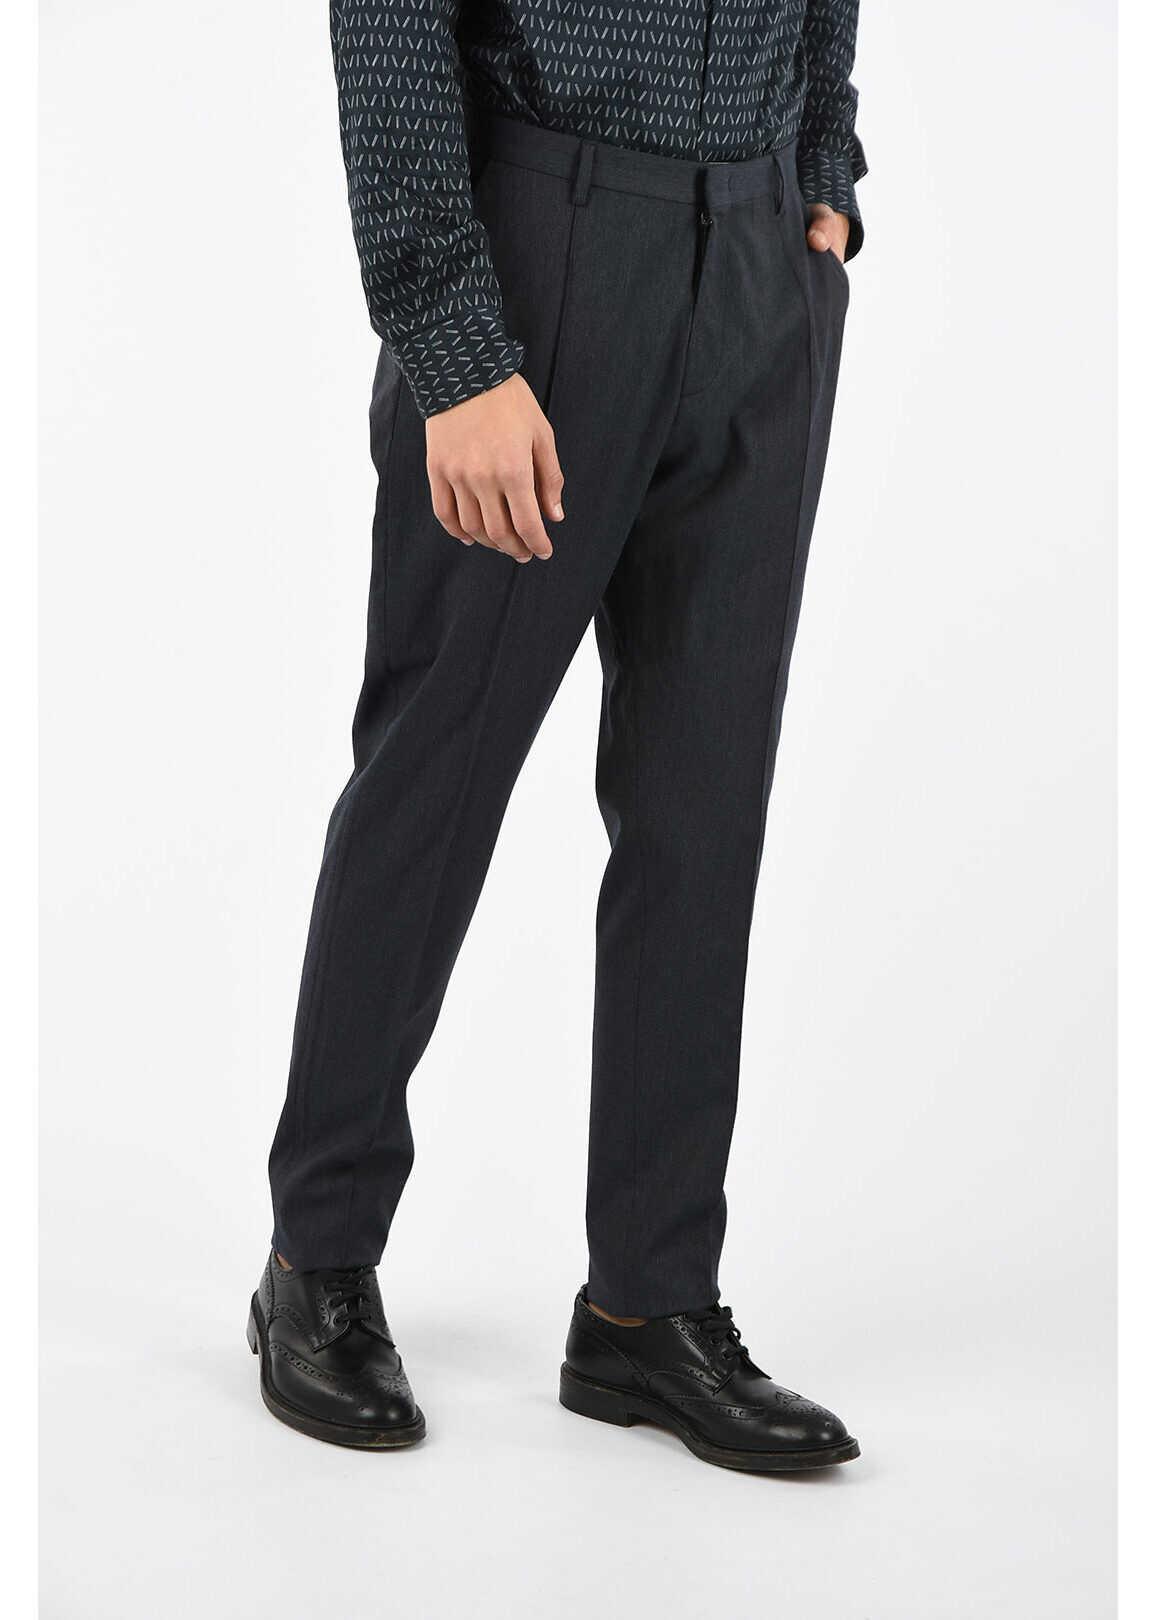 Armani COLLEZIONI double pleat pants GRAY